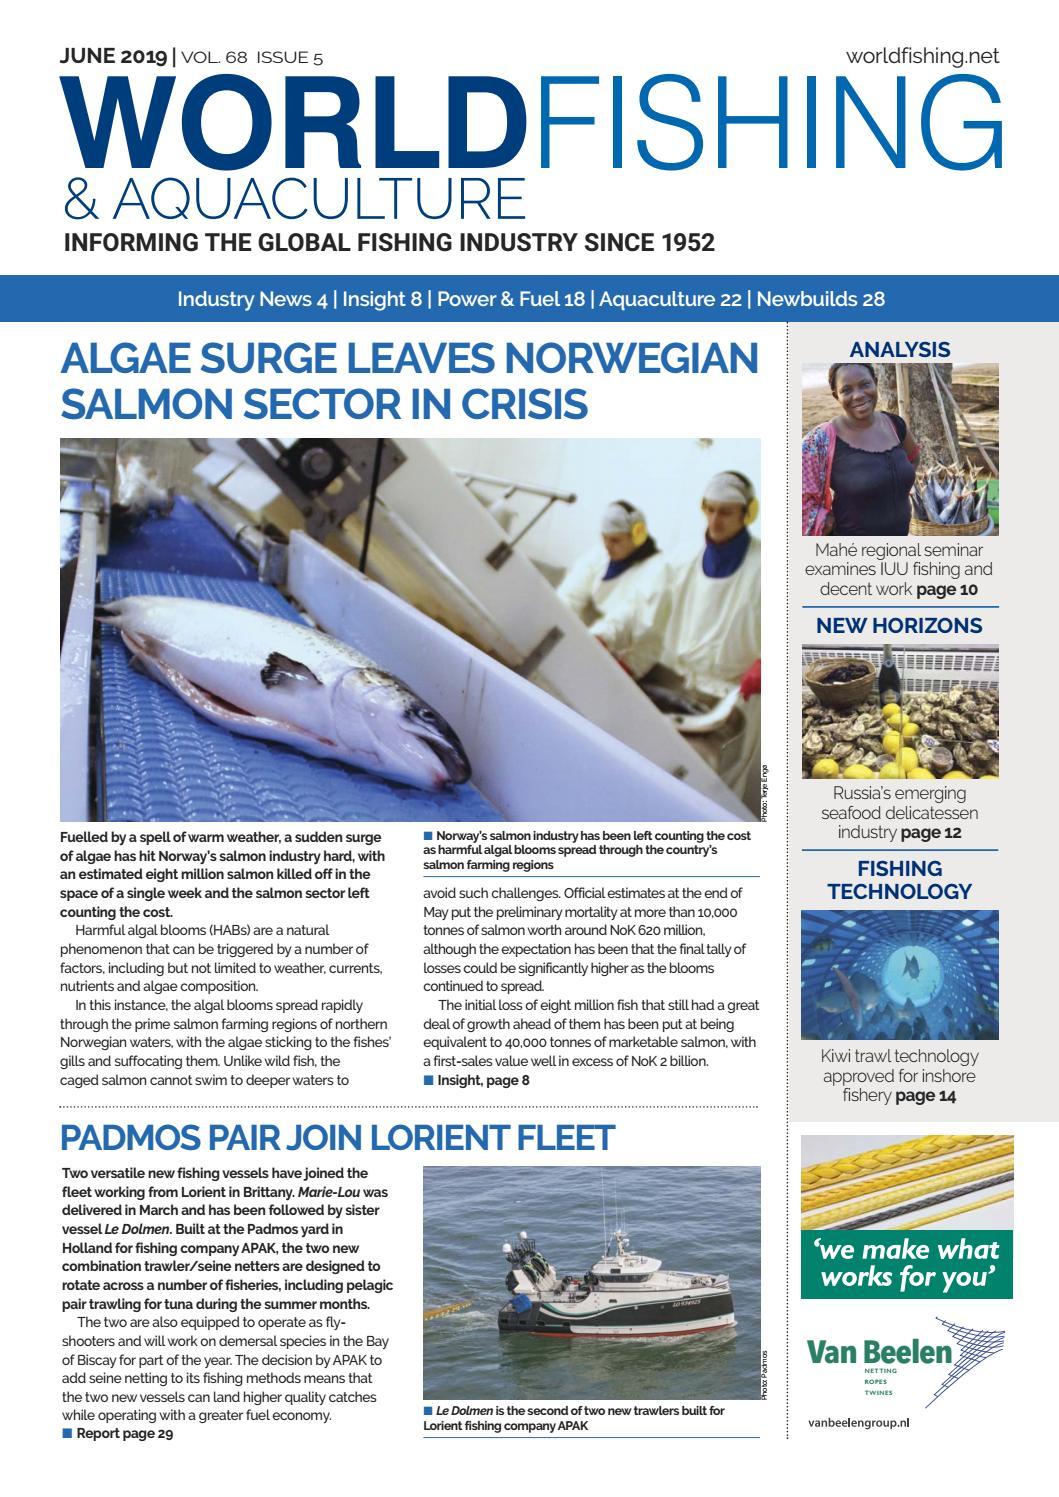 World Fishing & Aquaculture June 2019 by Mercator Media - issuu